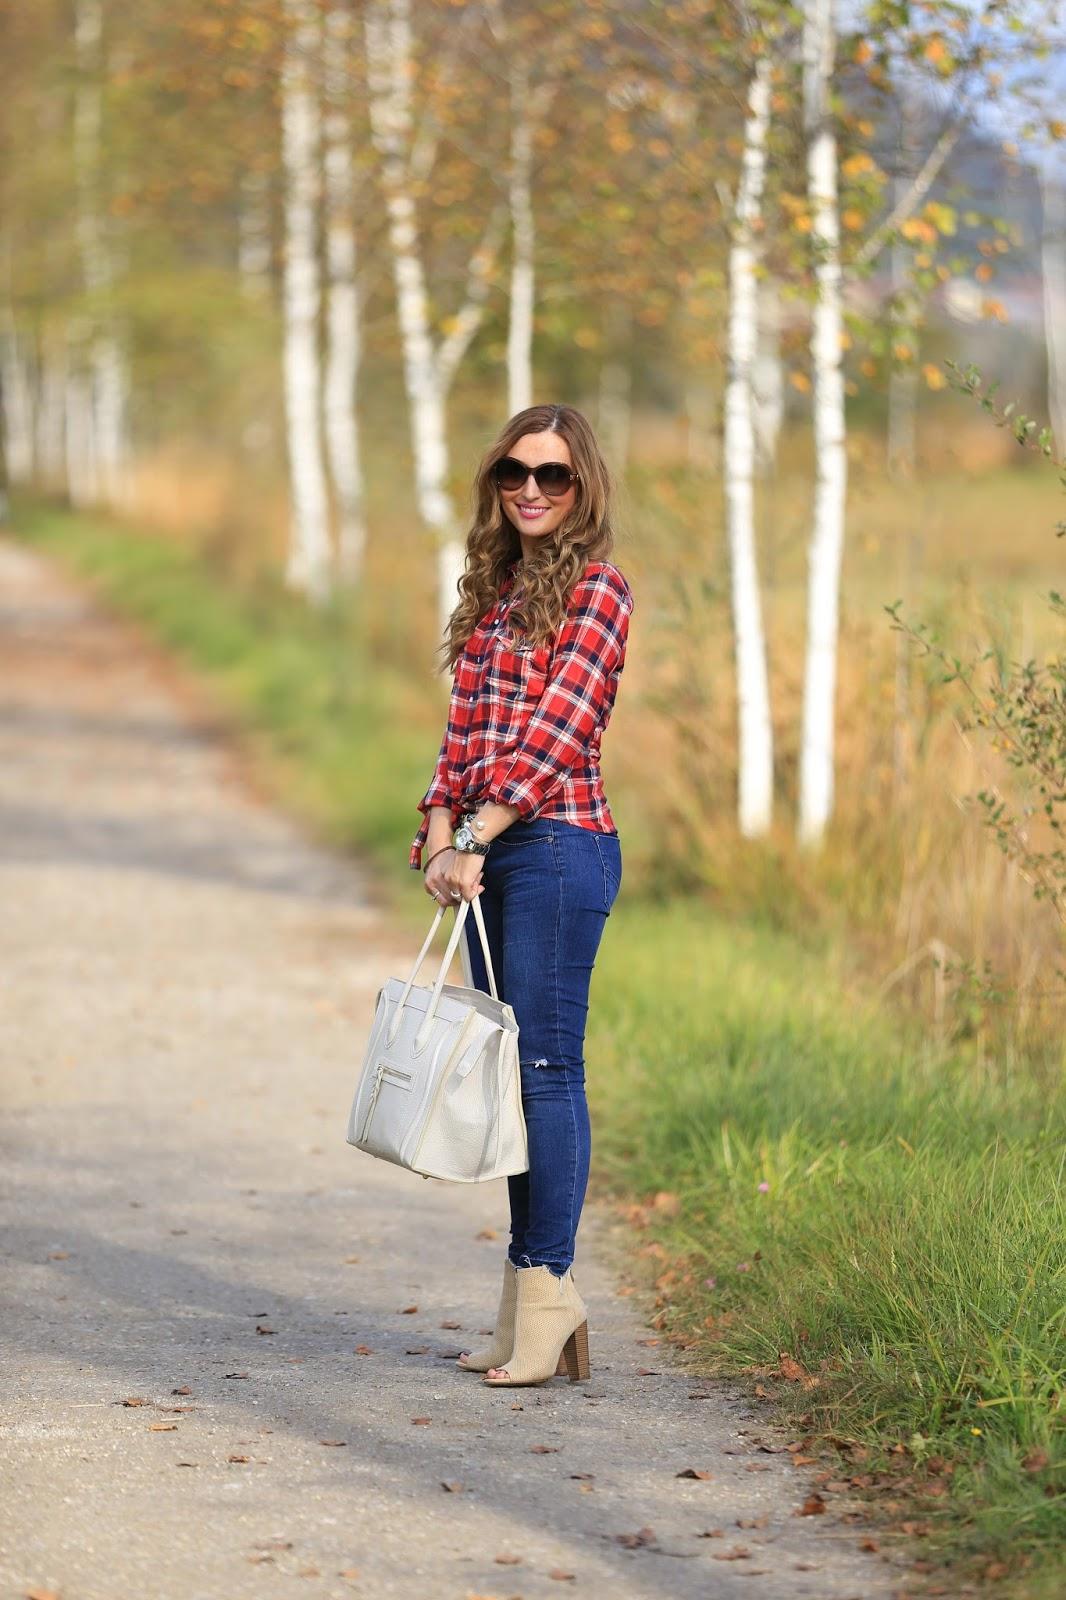 Country Fashion_Countryoutfit_Country_lookfashionblog-Frankfurt-fashionstylebyjohanna-styleblog-munich-blogger-deutschland-fashionblogger-bloggerdeutschland-lifestyleblog-modeblog-germanblogger-summer-look-outfit-inspiration